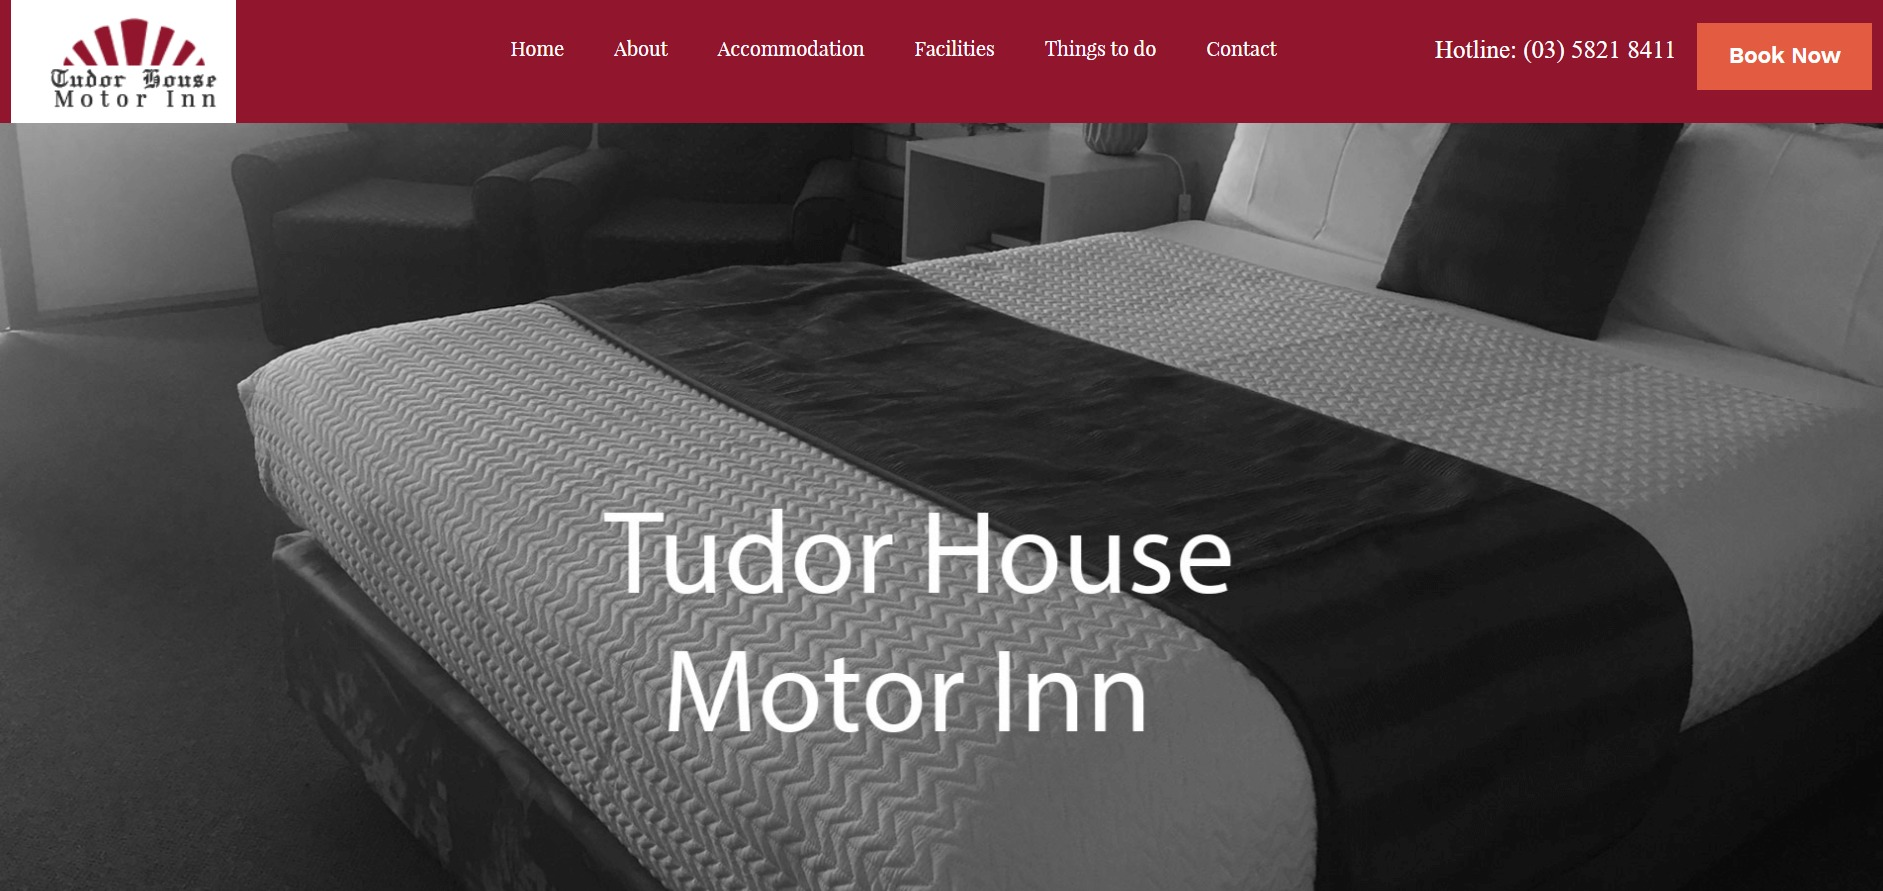 Tudor House Motor Inn